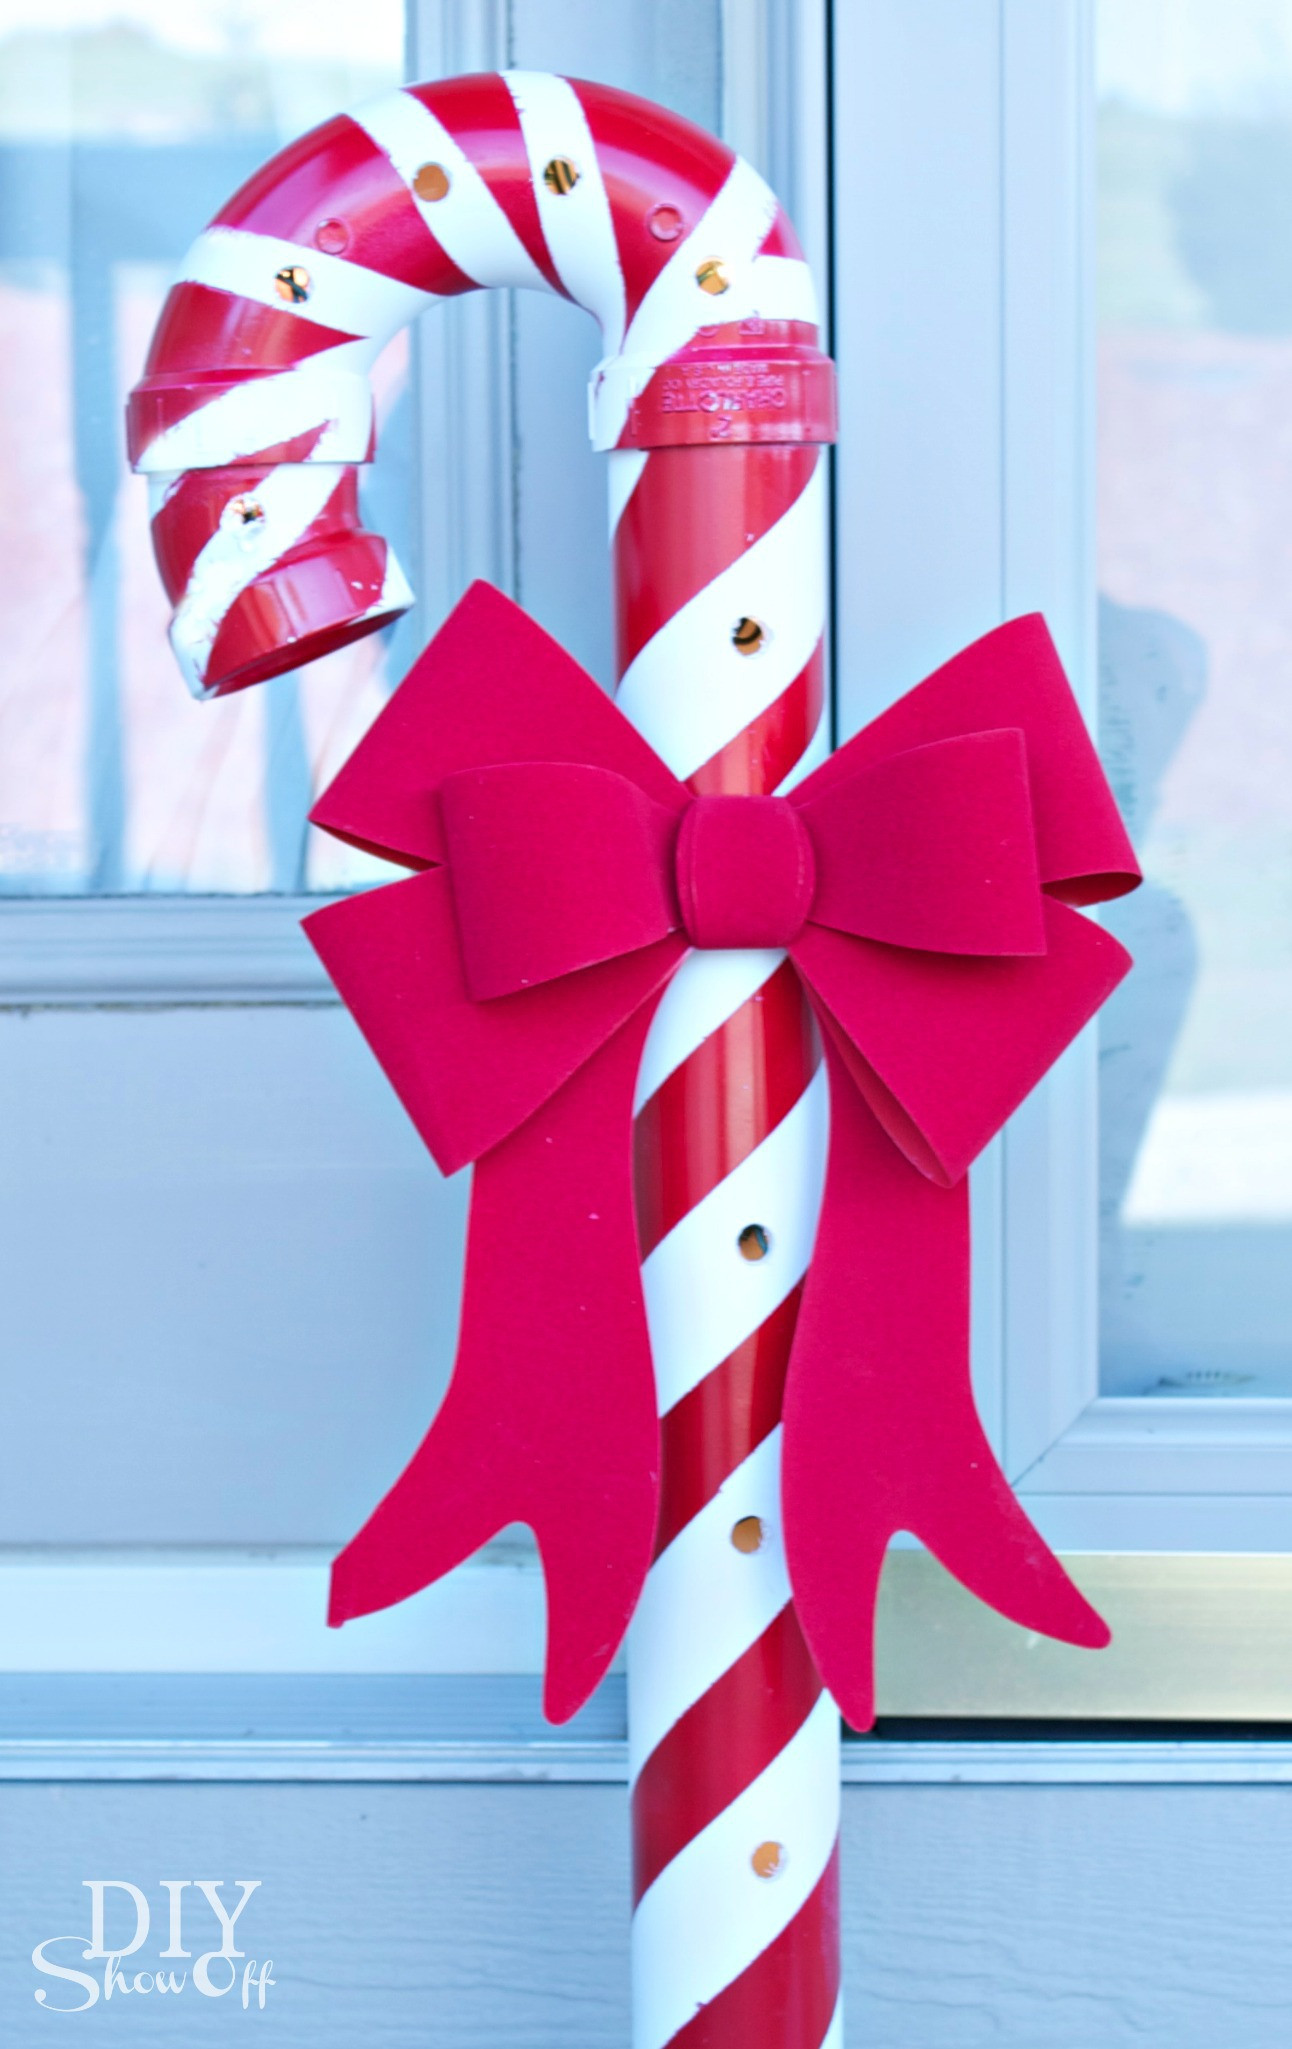 Christmas Candy Cane  Lighted PVC Candy Canes DIY Christmas Home Decor DIY